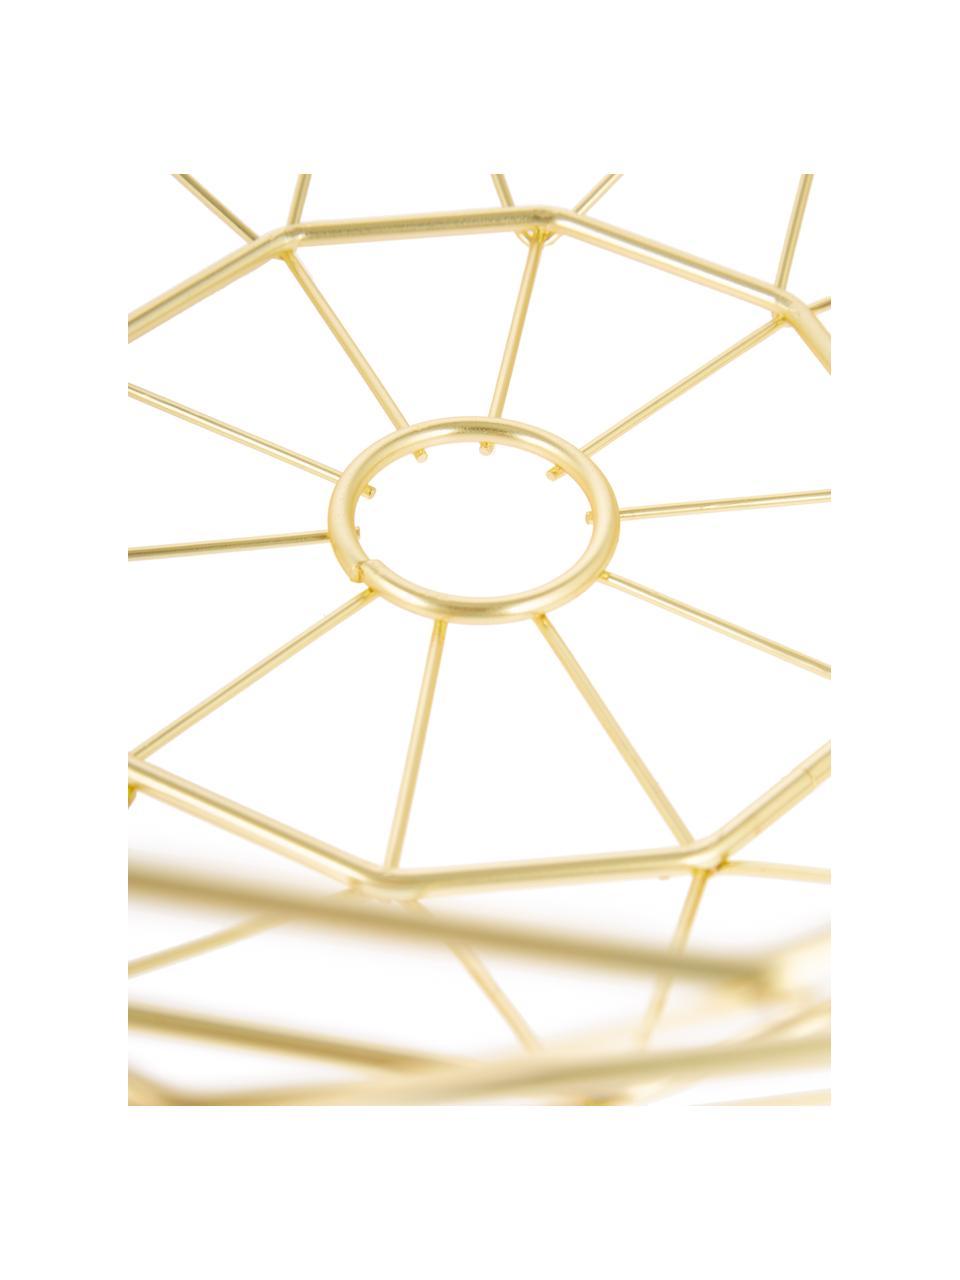 Cestino Diamond Cut, Metallo, Dorato opaco, Ø 35 x Alt. 13 cm